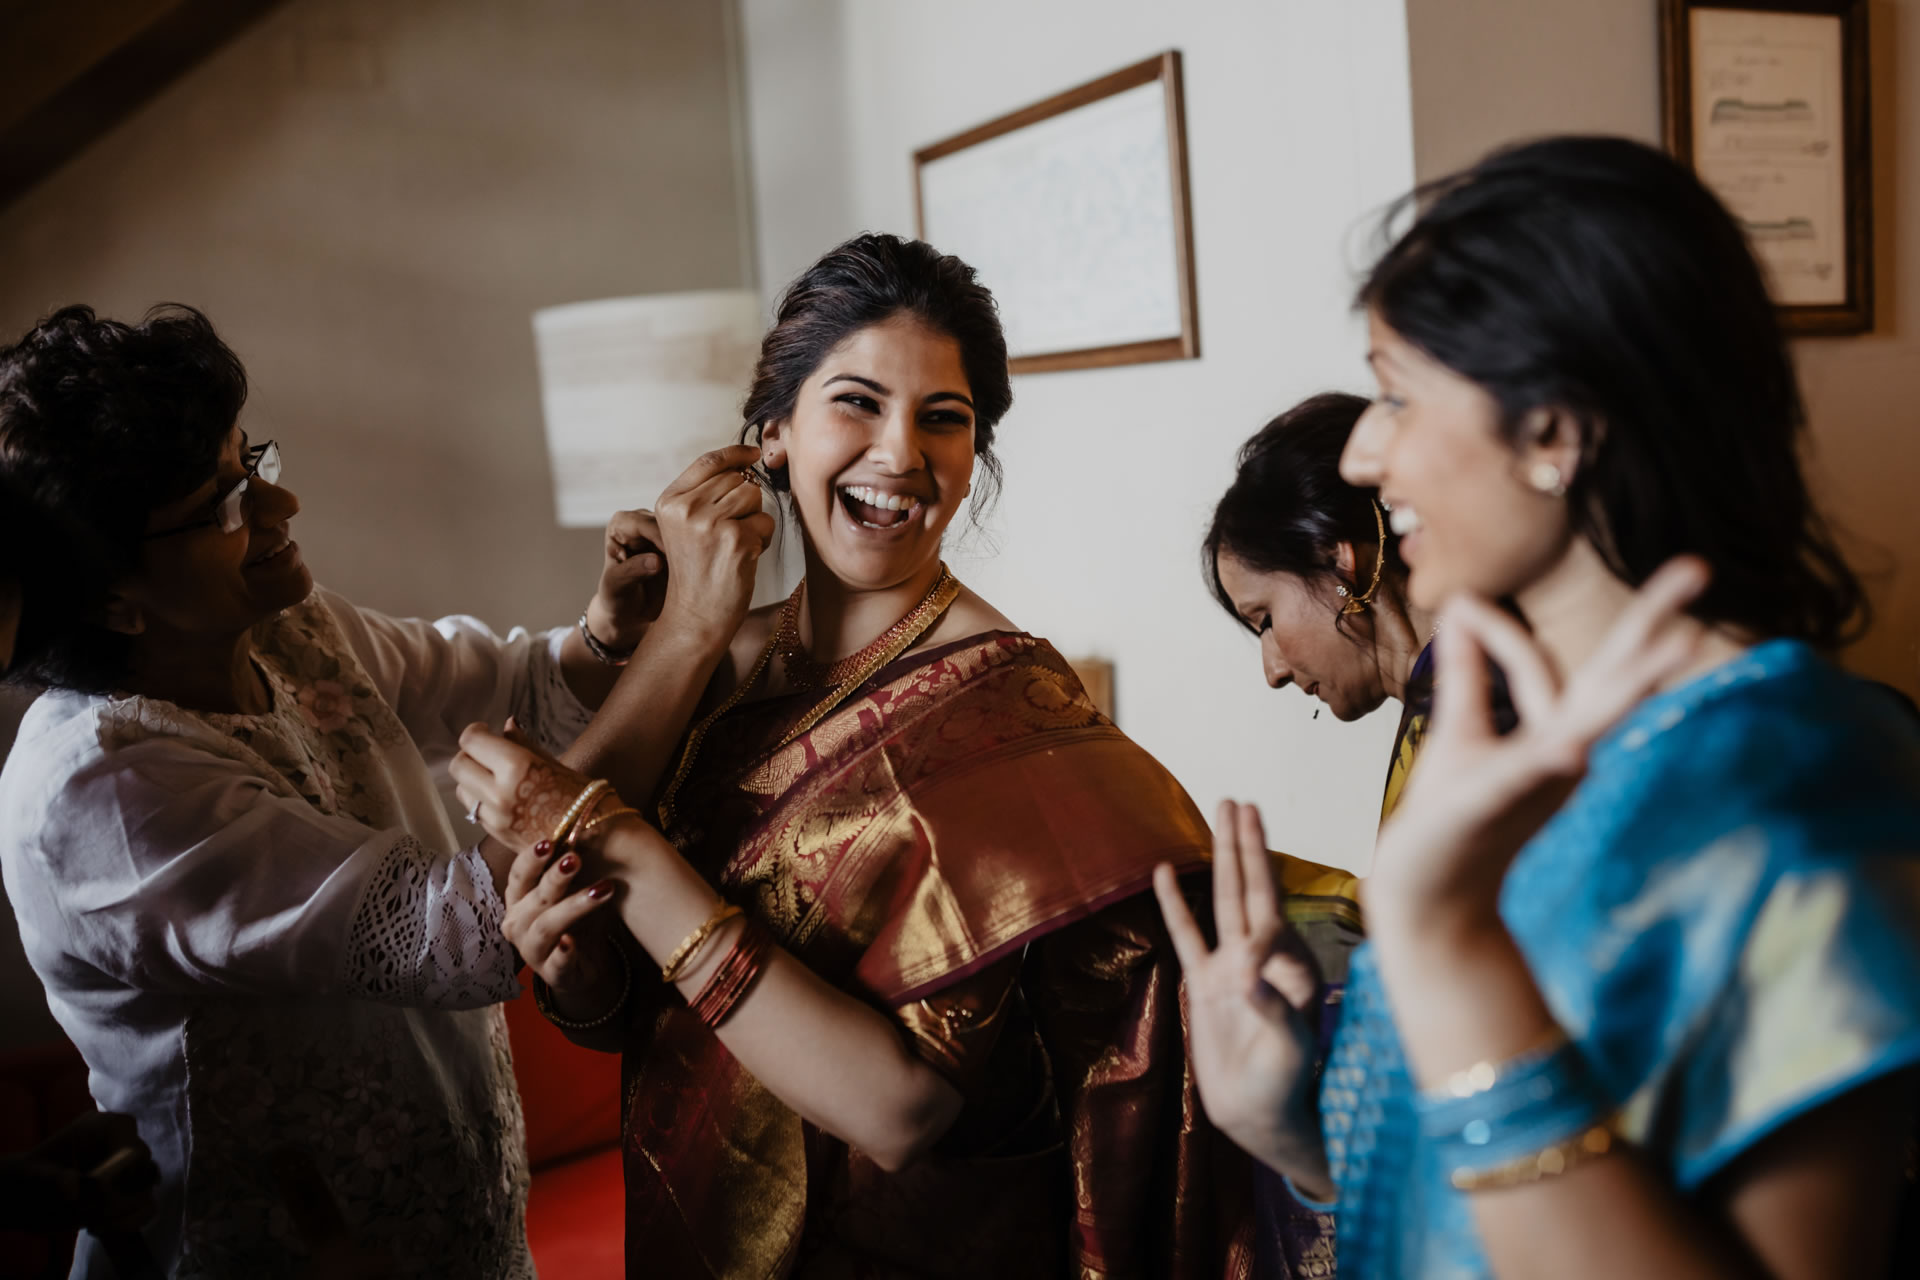 - 1 :: Indian wedding ceremony at Villa Pitiana :: Luxury wedding photography - 0 ::  - 1